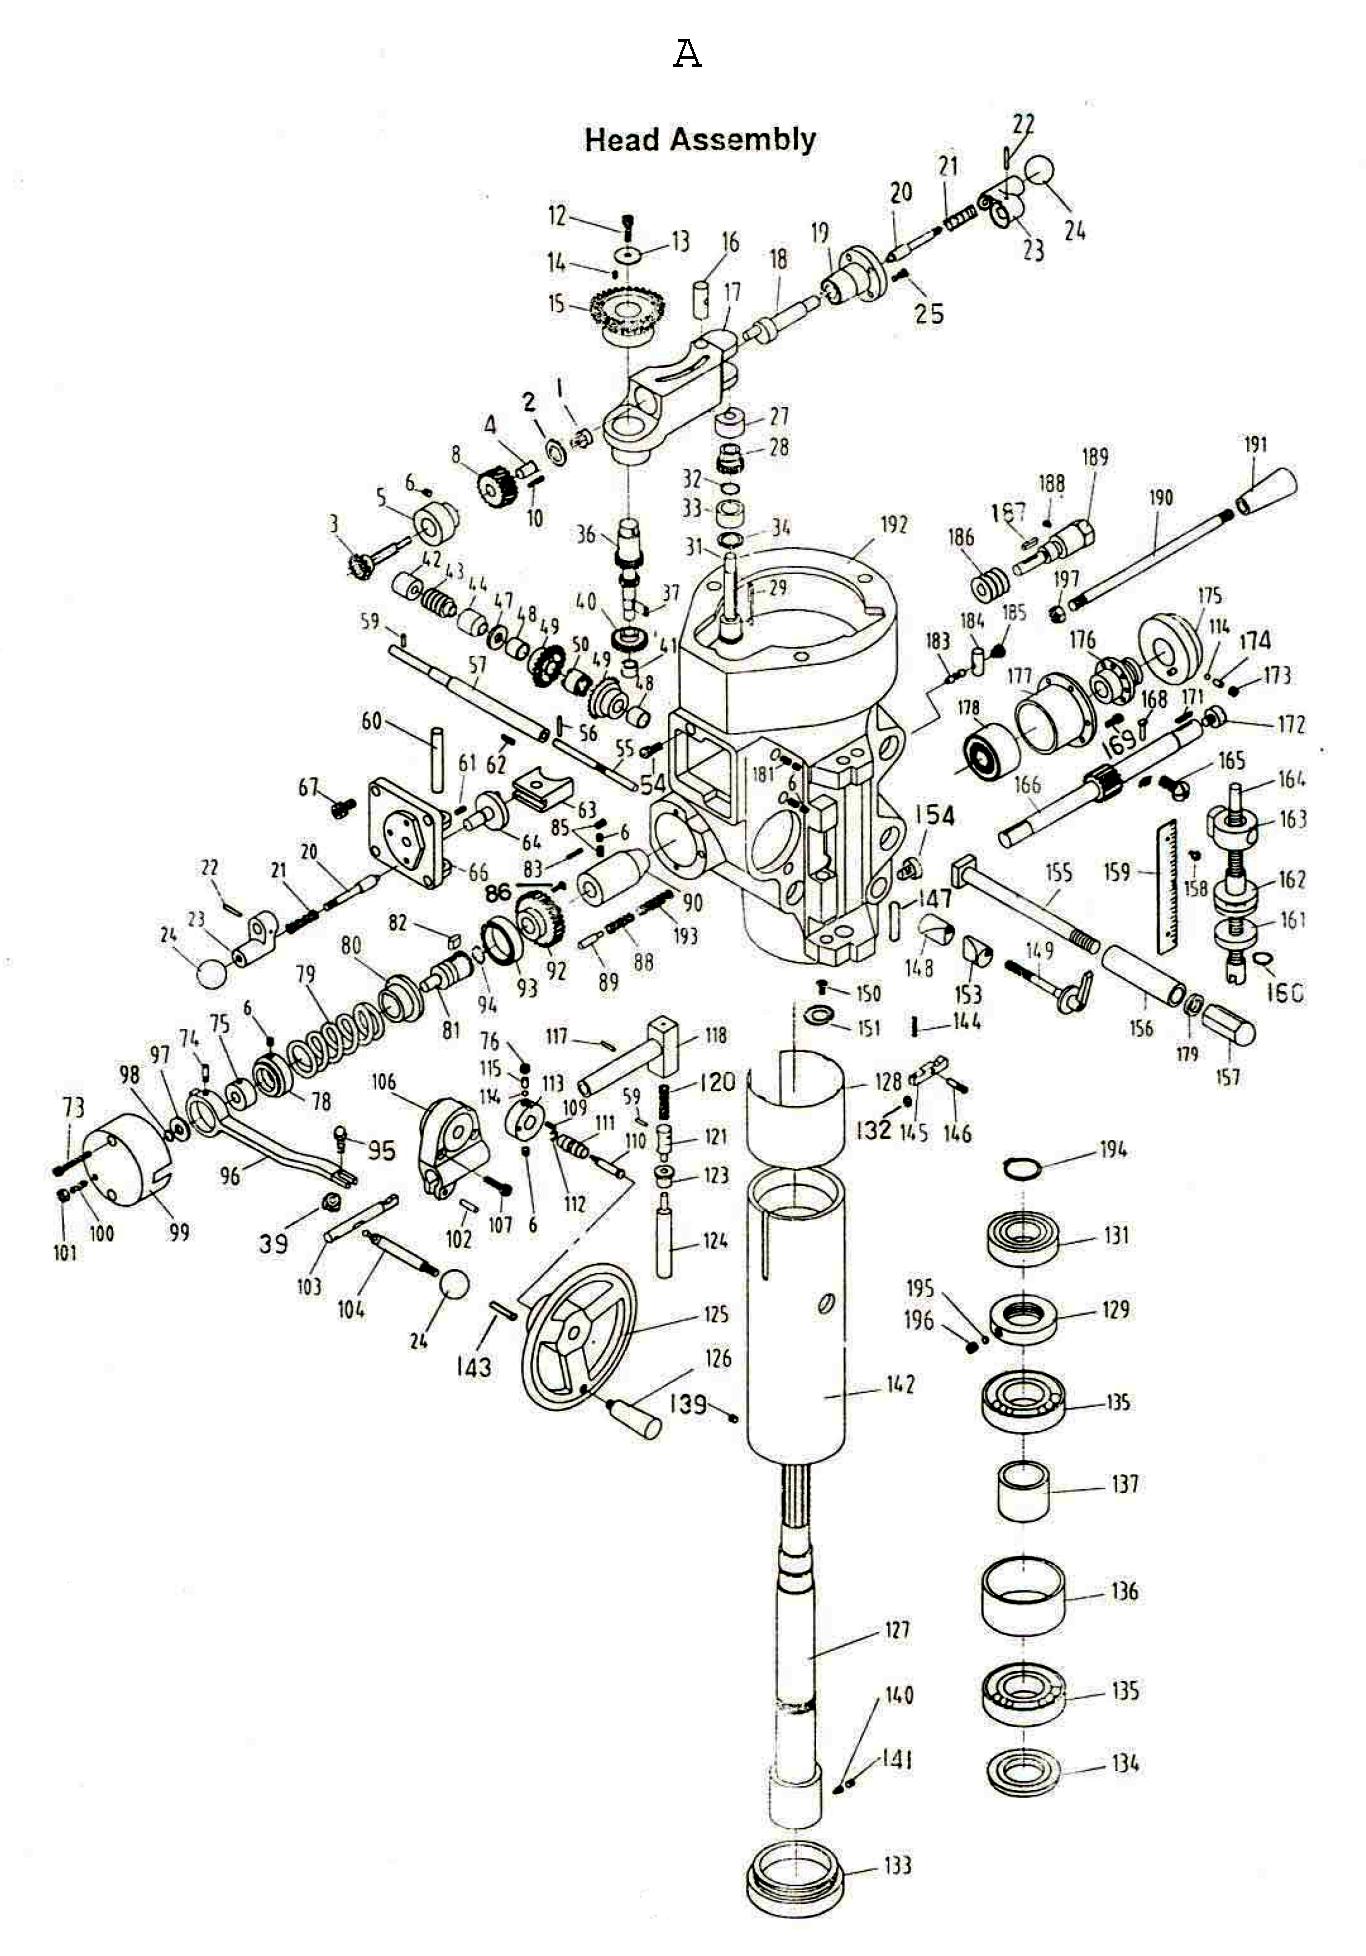 690910-jet-PB-1Break Down